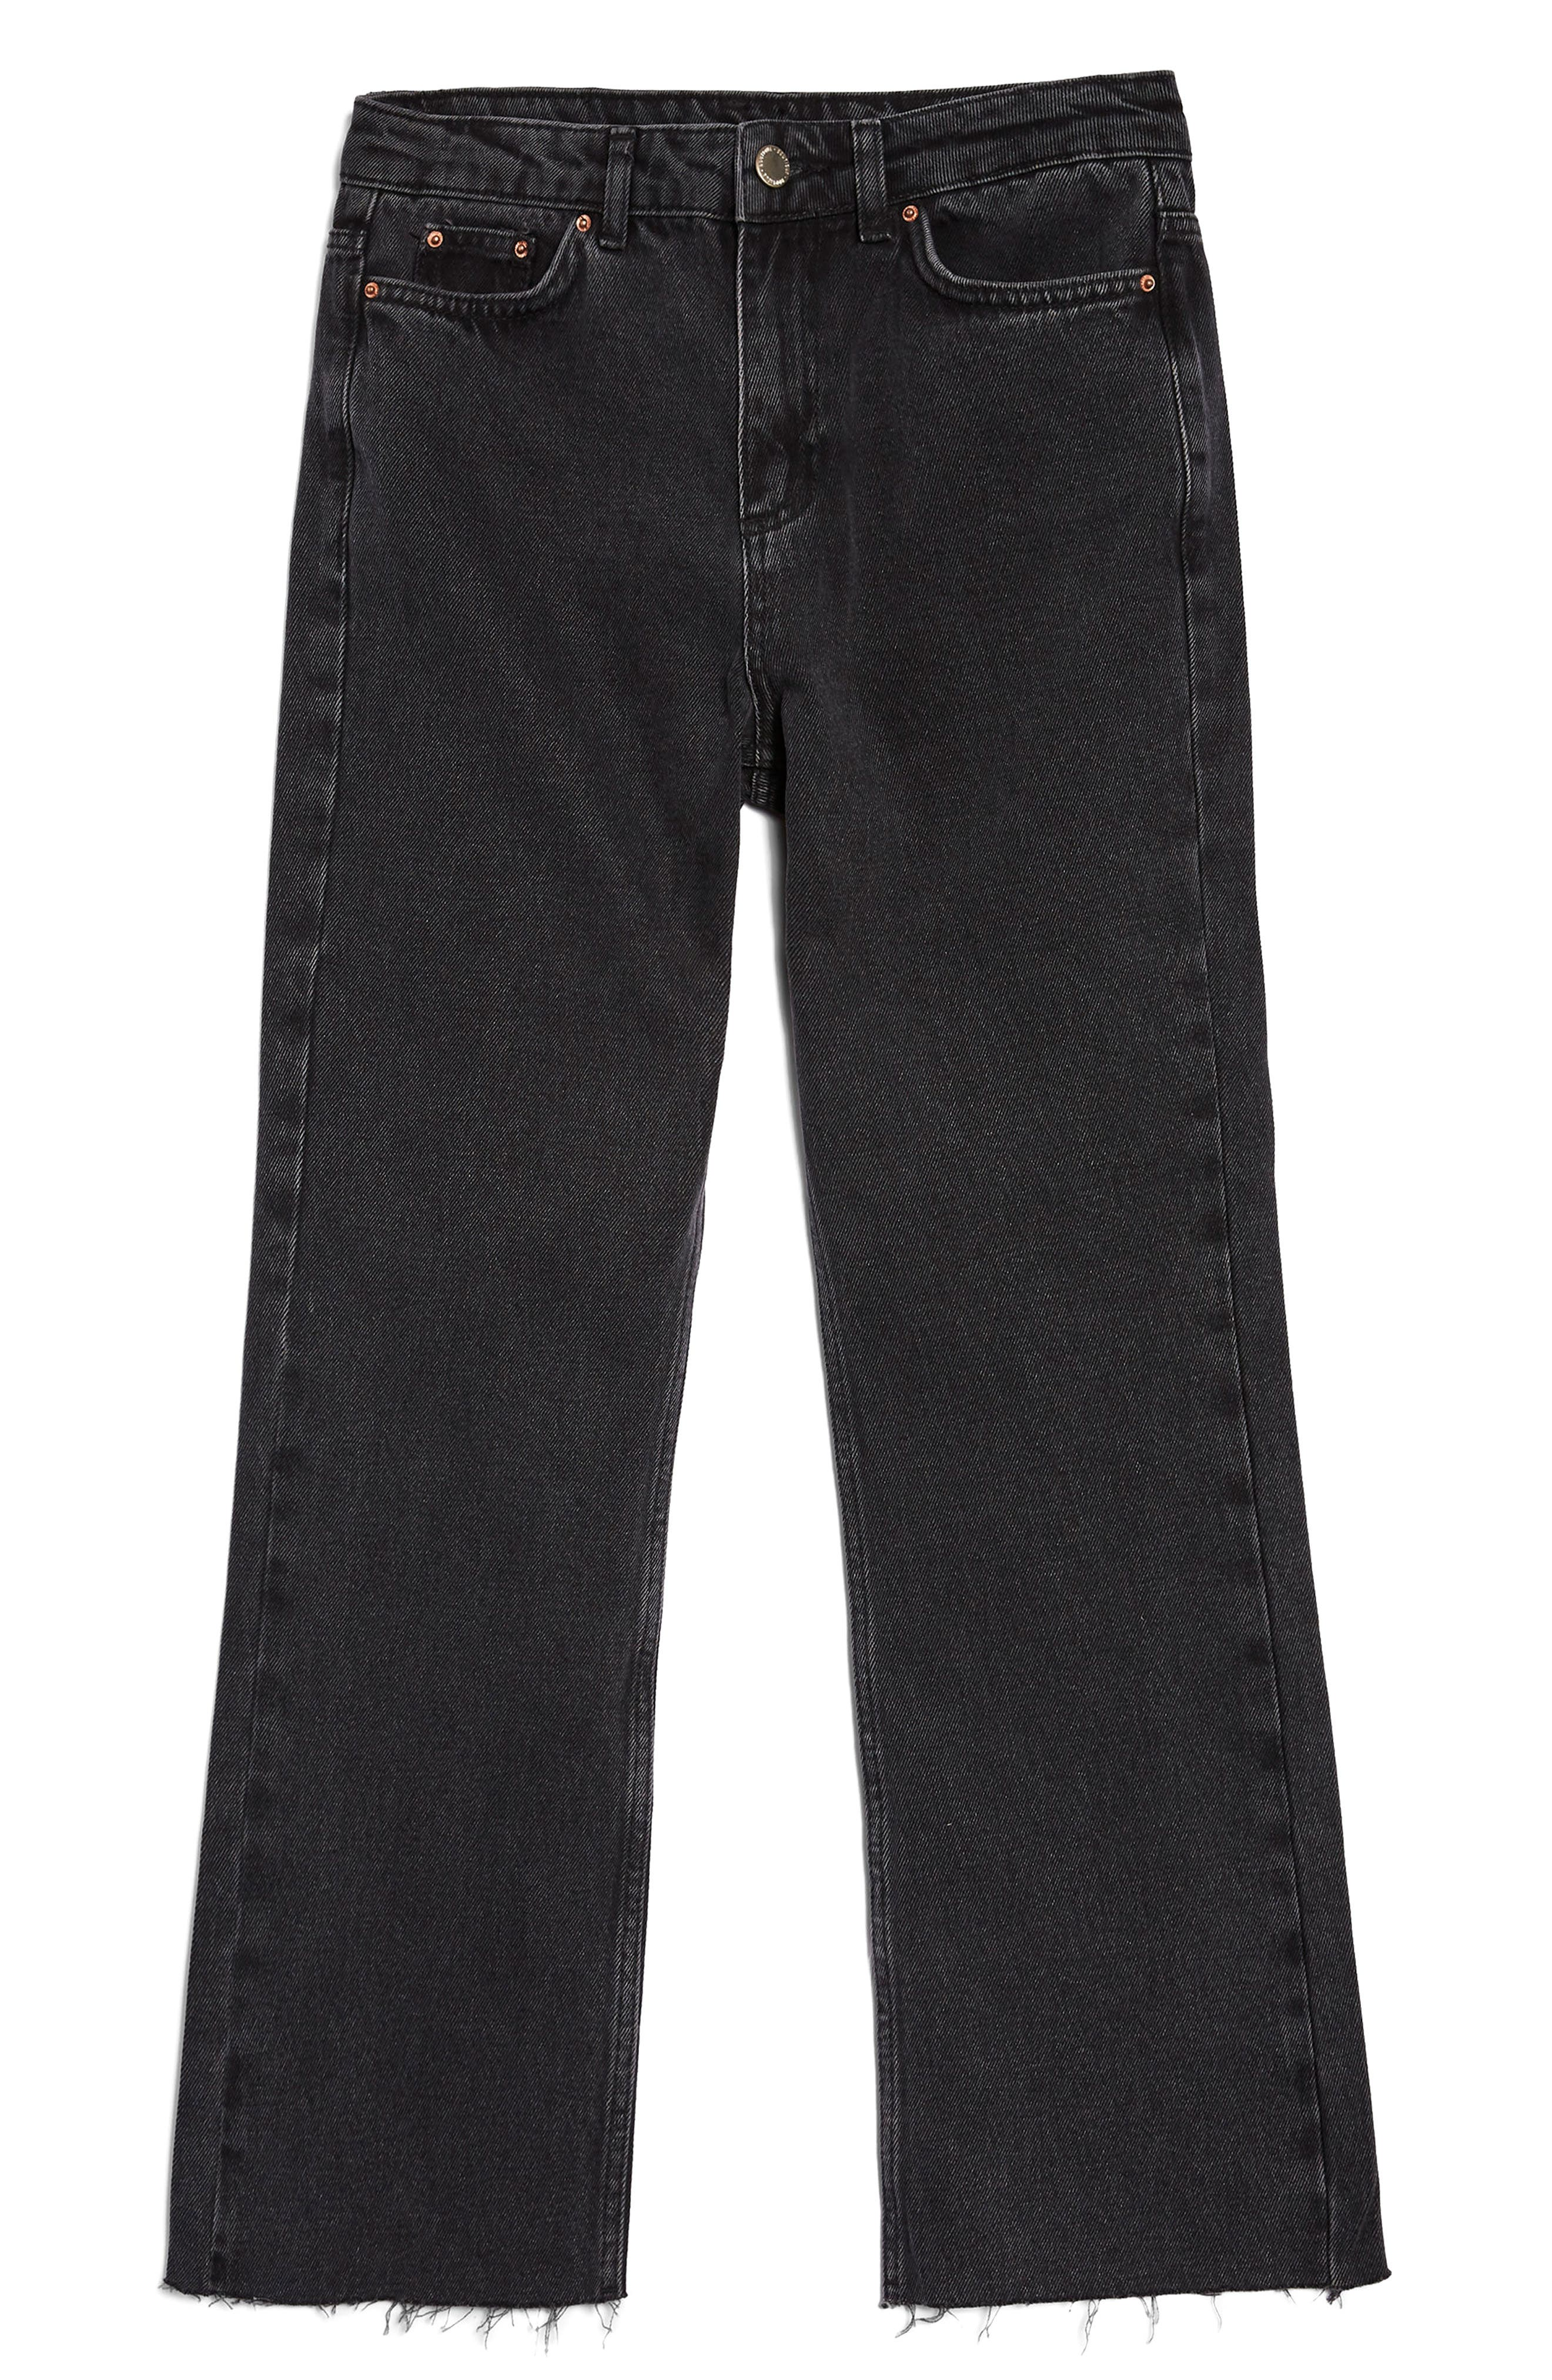 Main Image - Topshop Boutique Raw Hem Kick Flare Jeans